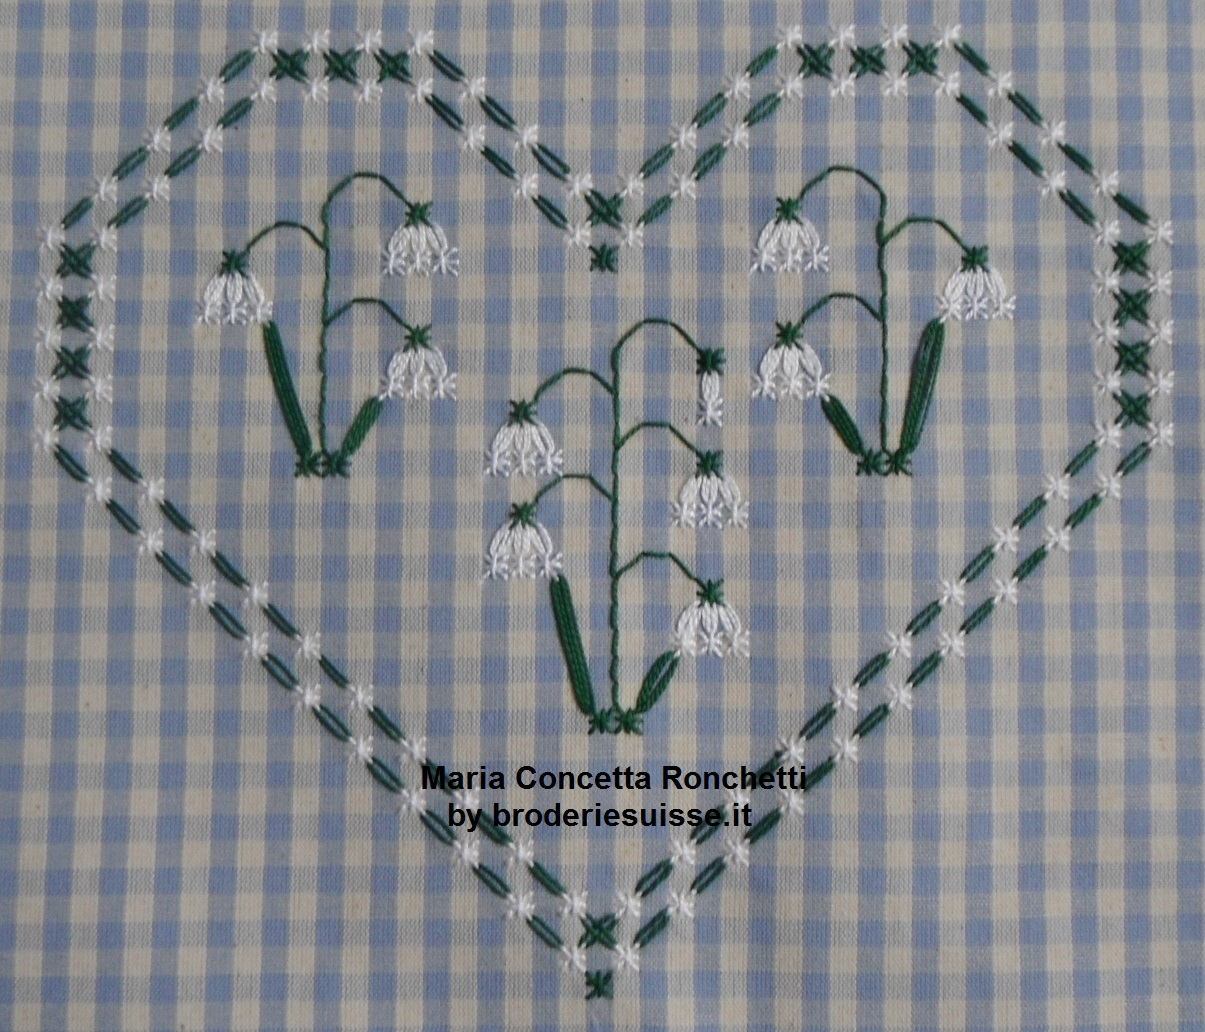 05-Maggio-cuore-broderie-suisse